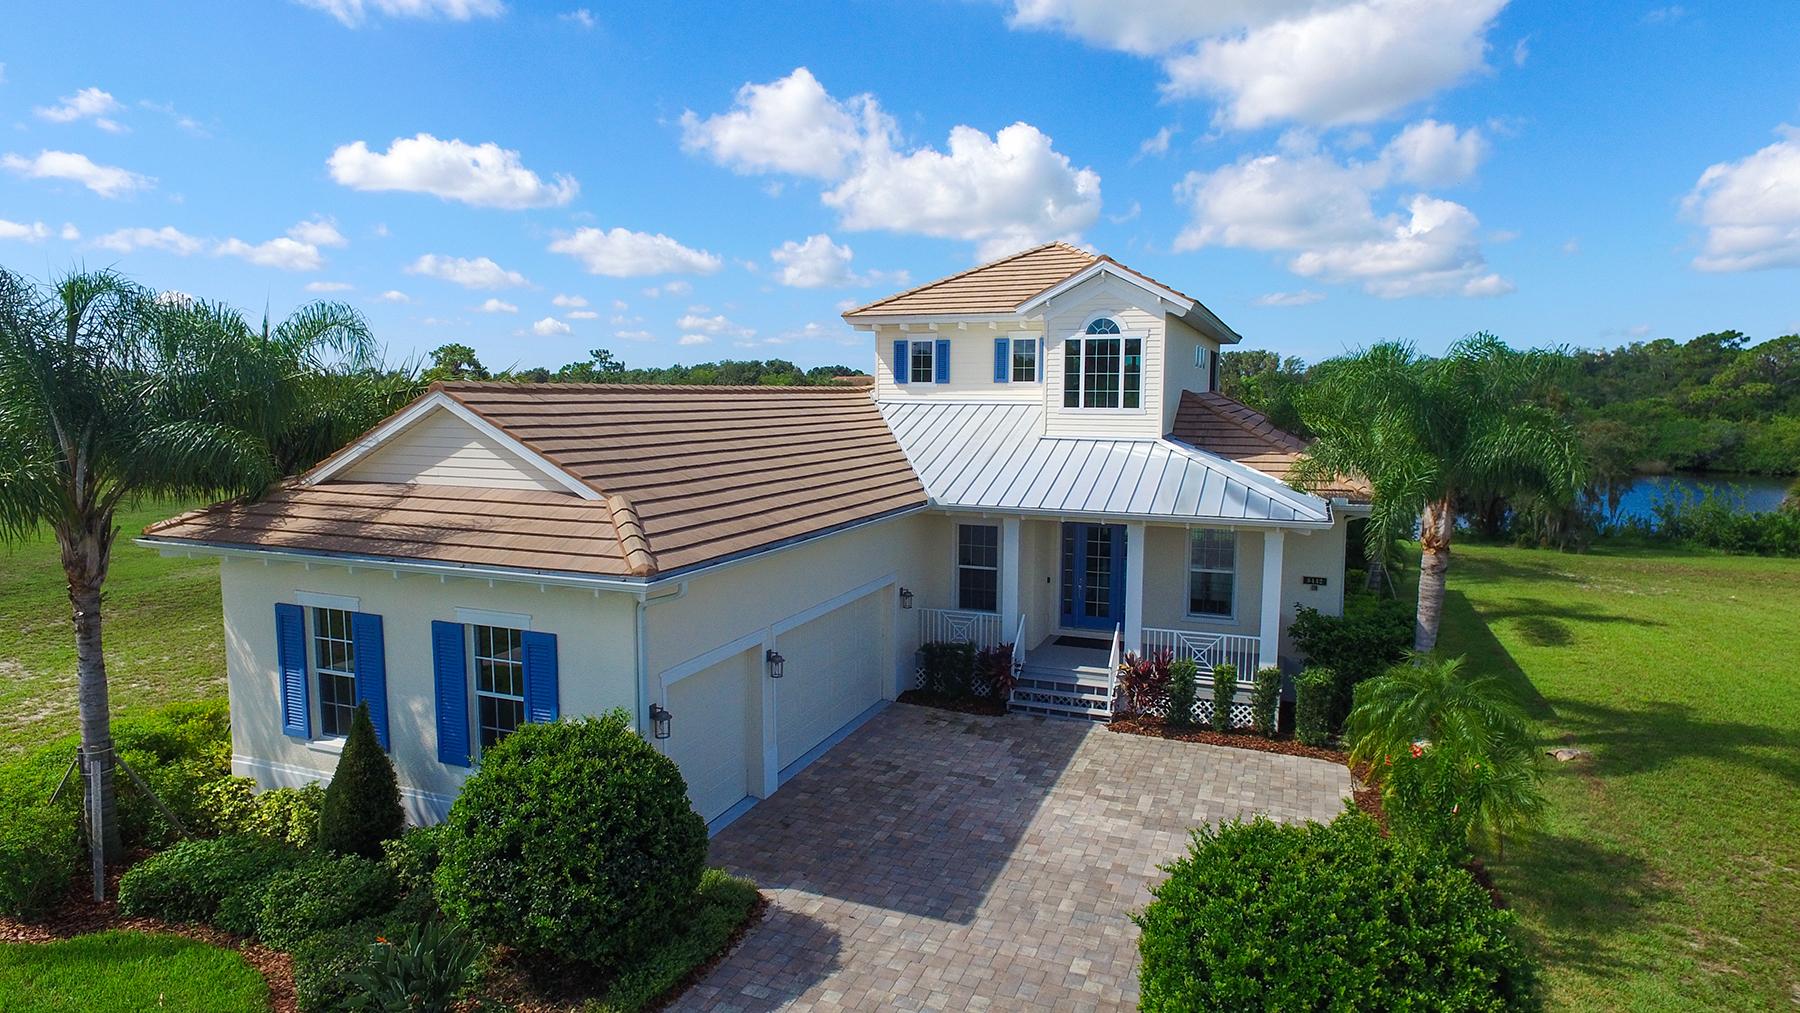 Casa Unifamiliar por un Venta en BRADENTON - MARSHALLS LANDING 5442 56th Ct E Bradenton, Florida, 34203 Estados Unidos